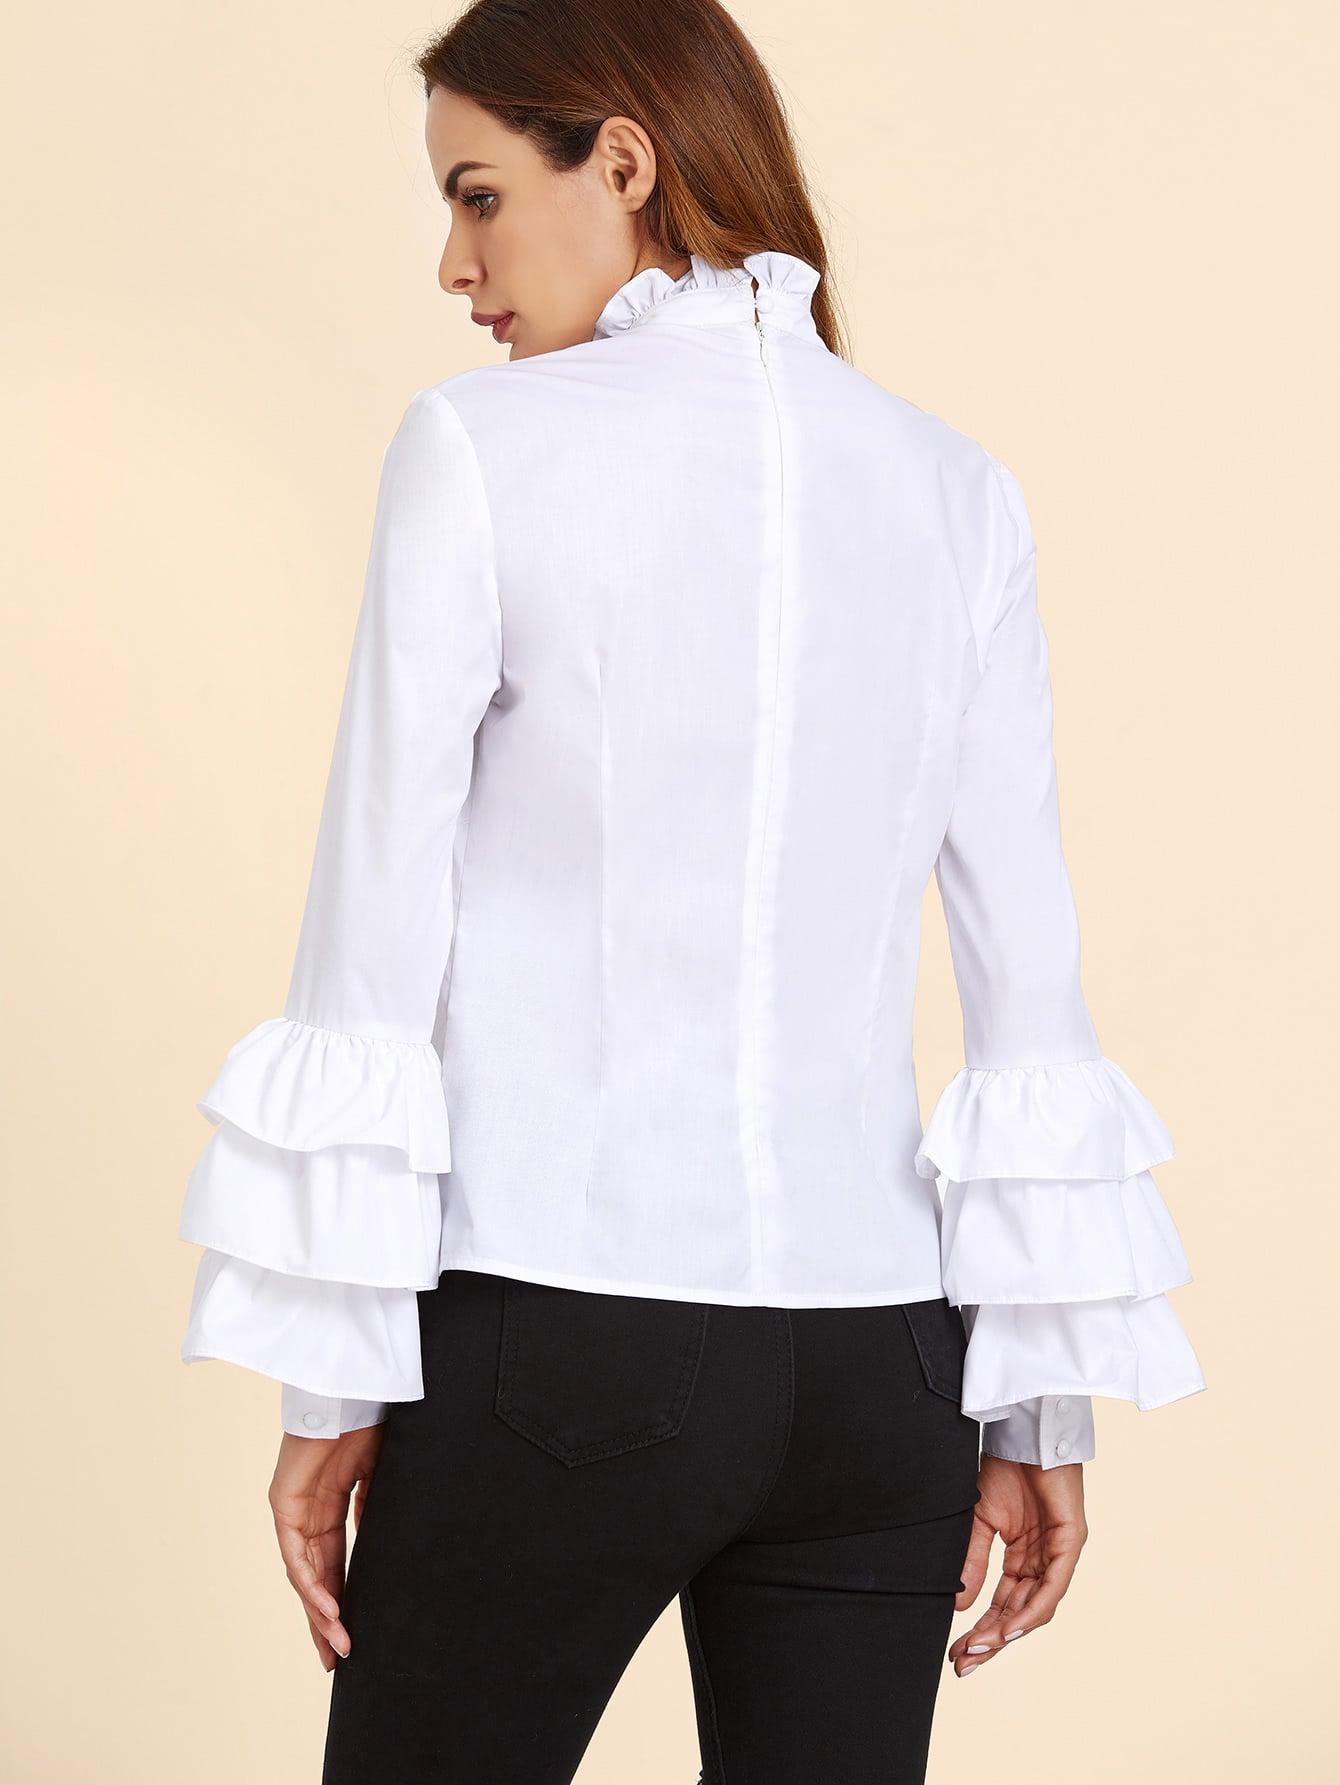 blouse161021705_2